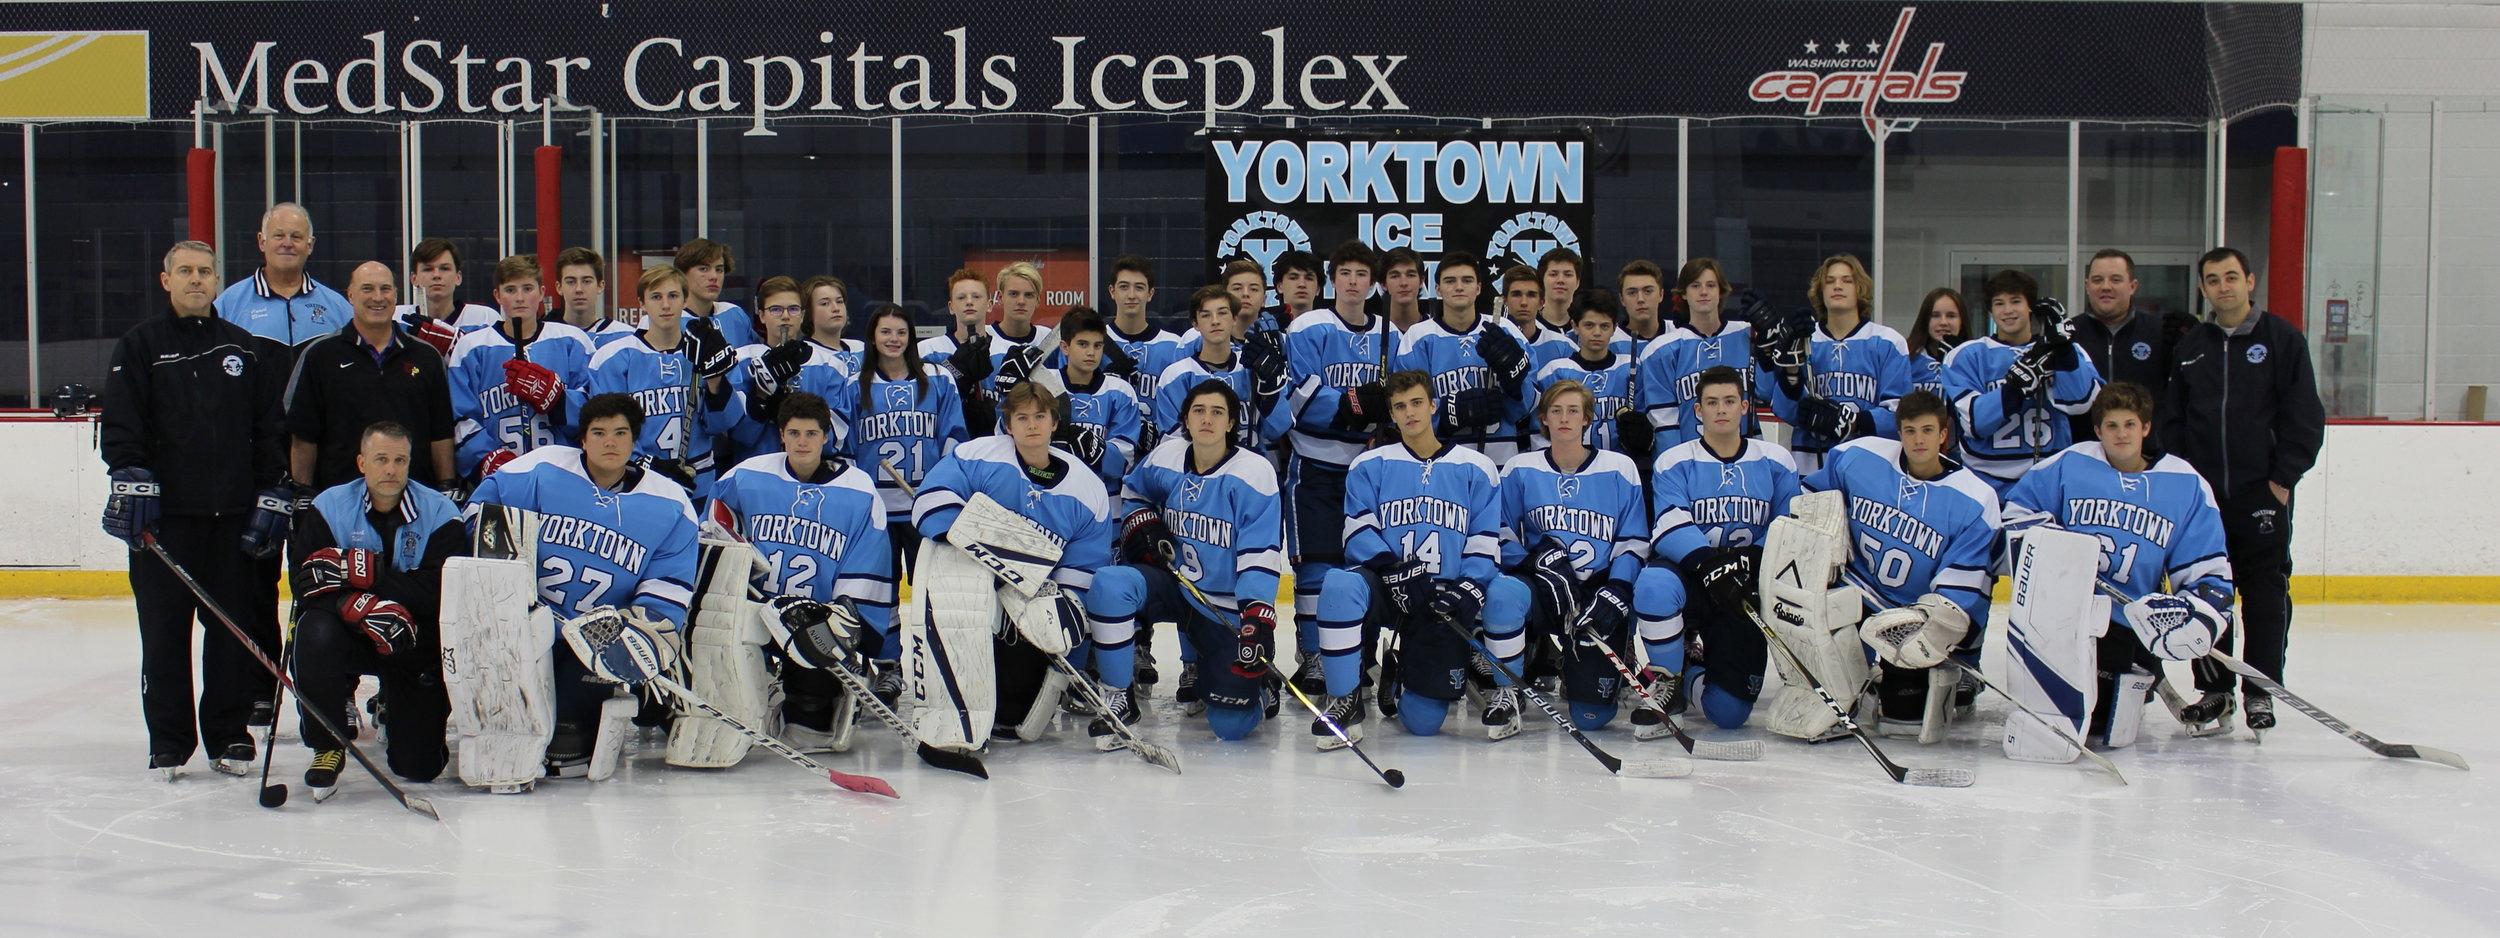 2018-19 Yorktown Patriots Ice Hockey Team